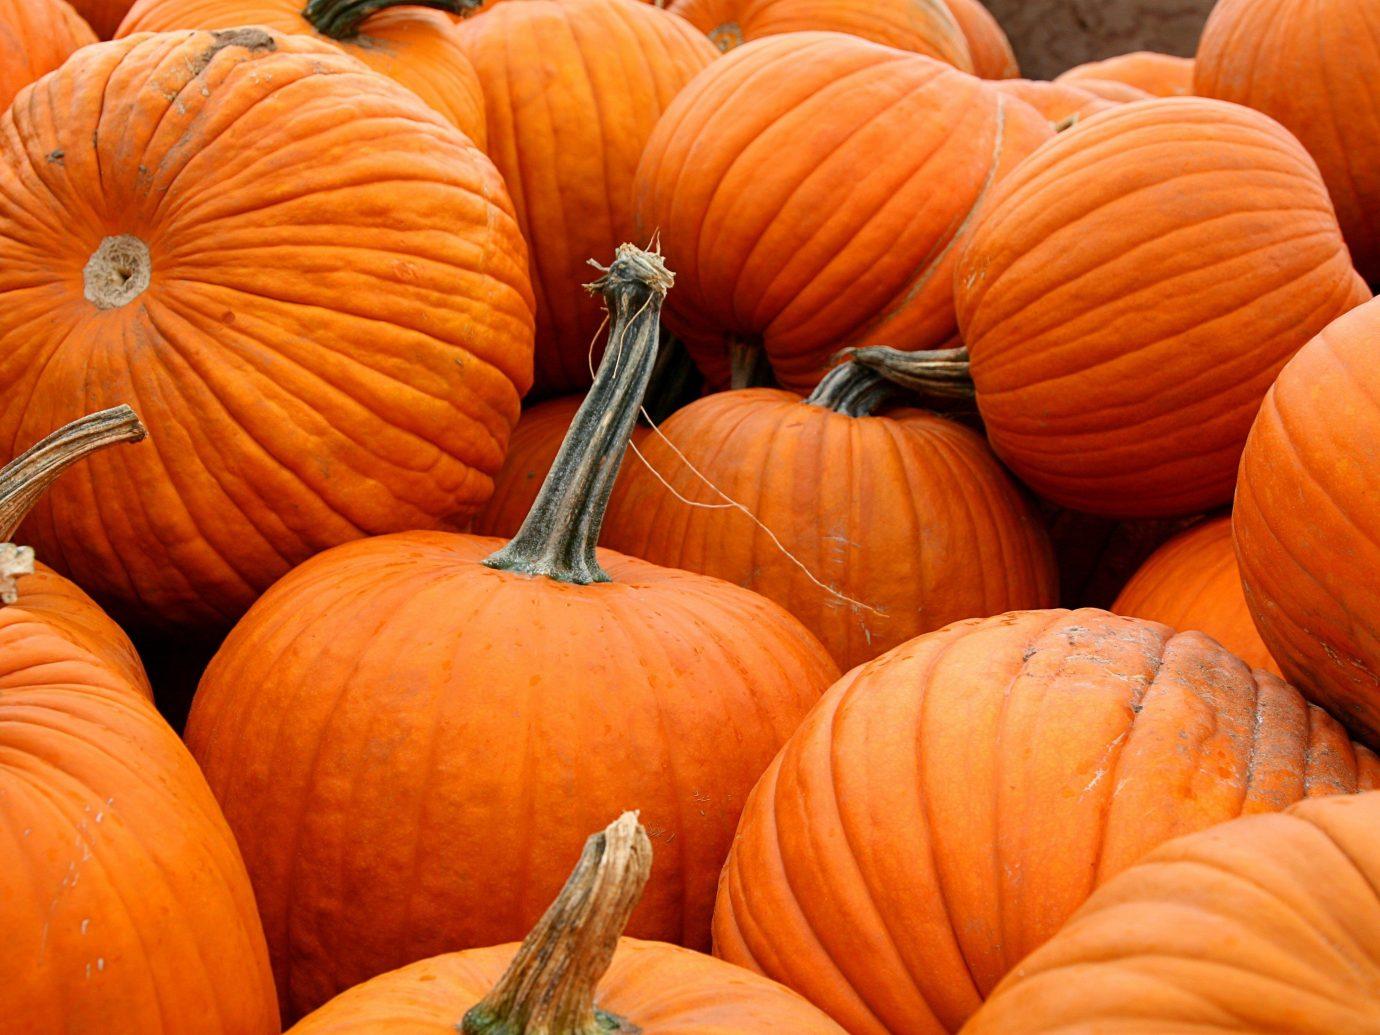 Trip Ideas squash fruit pumpkin winter squash calabaza carving autumn cucurbita produce gourd